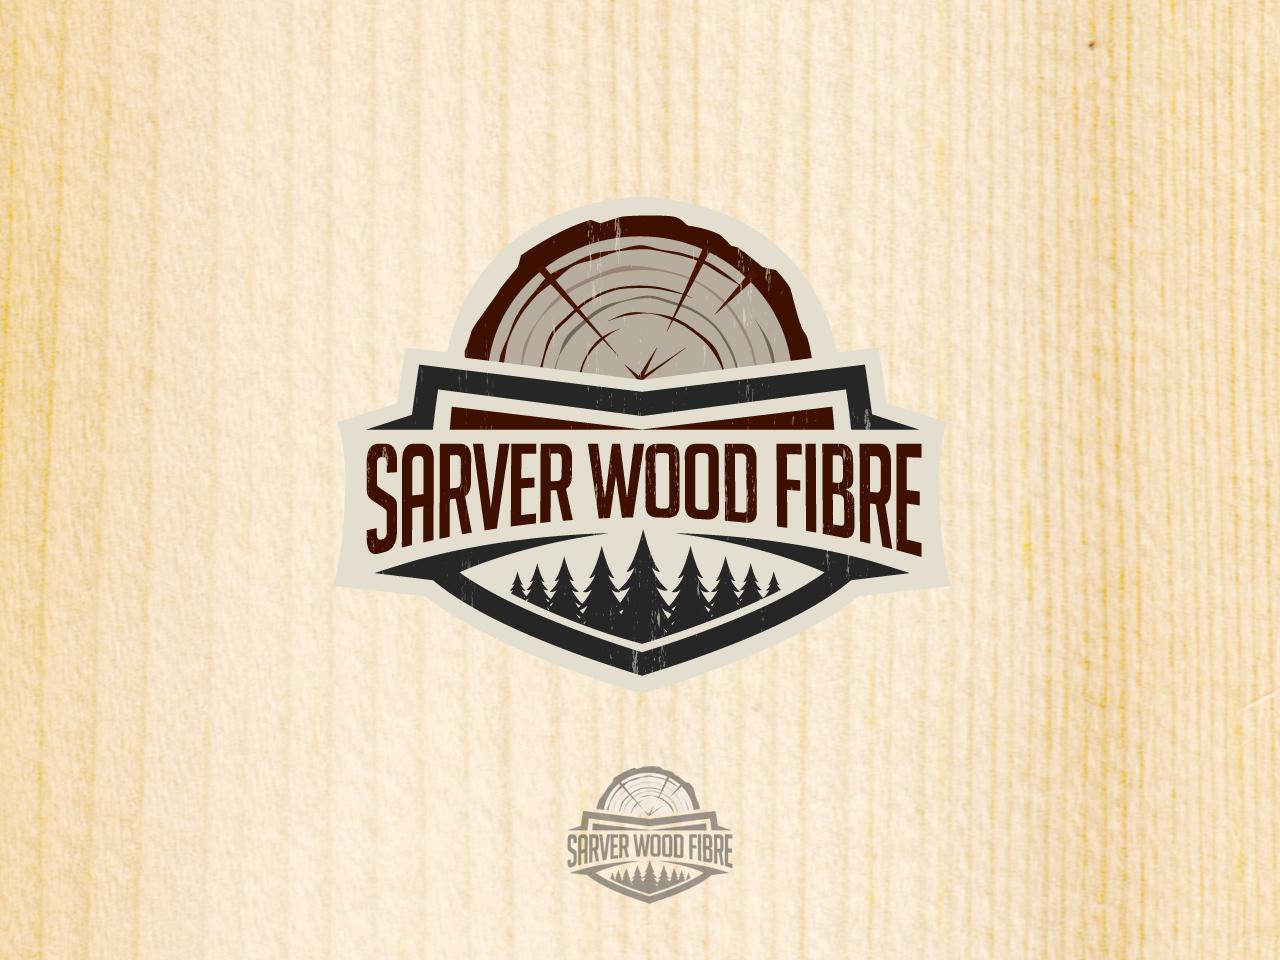 Logo Design by jpbituin - Entry No. 6 in the Logo Design Contest Creative Logo Design for Sarver Wood Fibre..